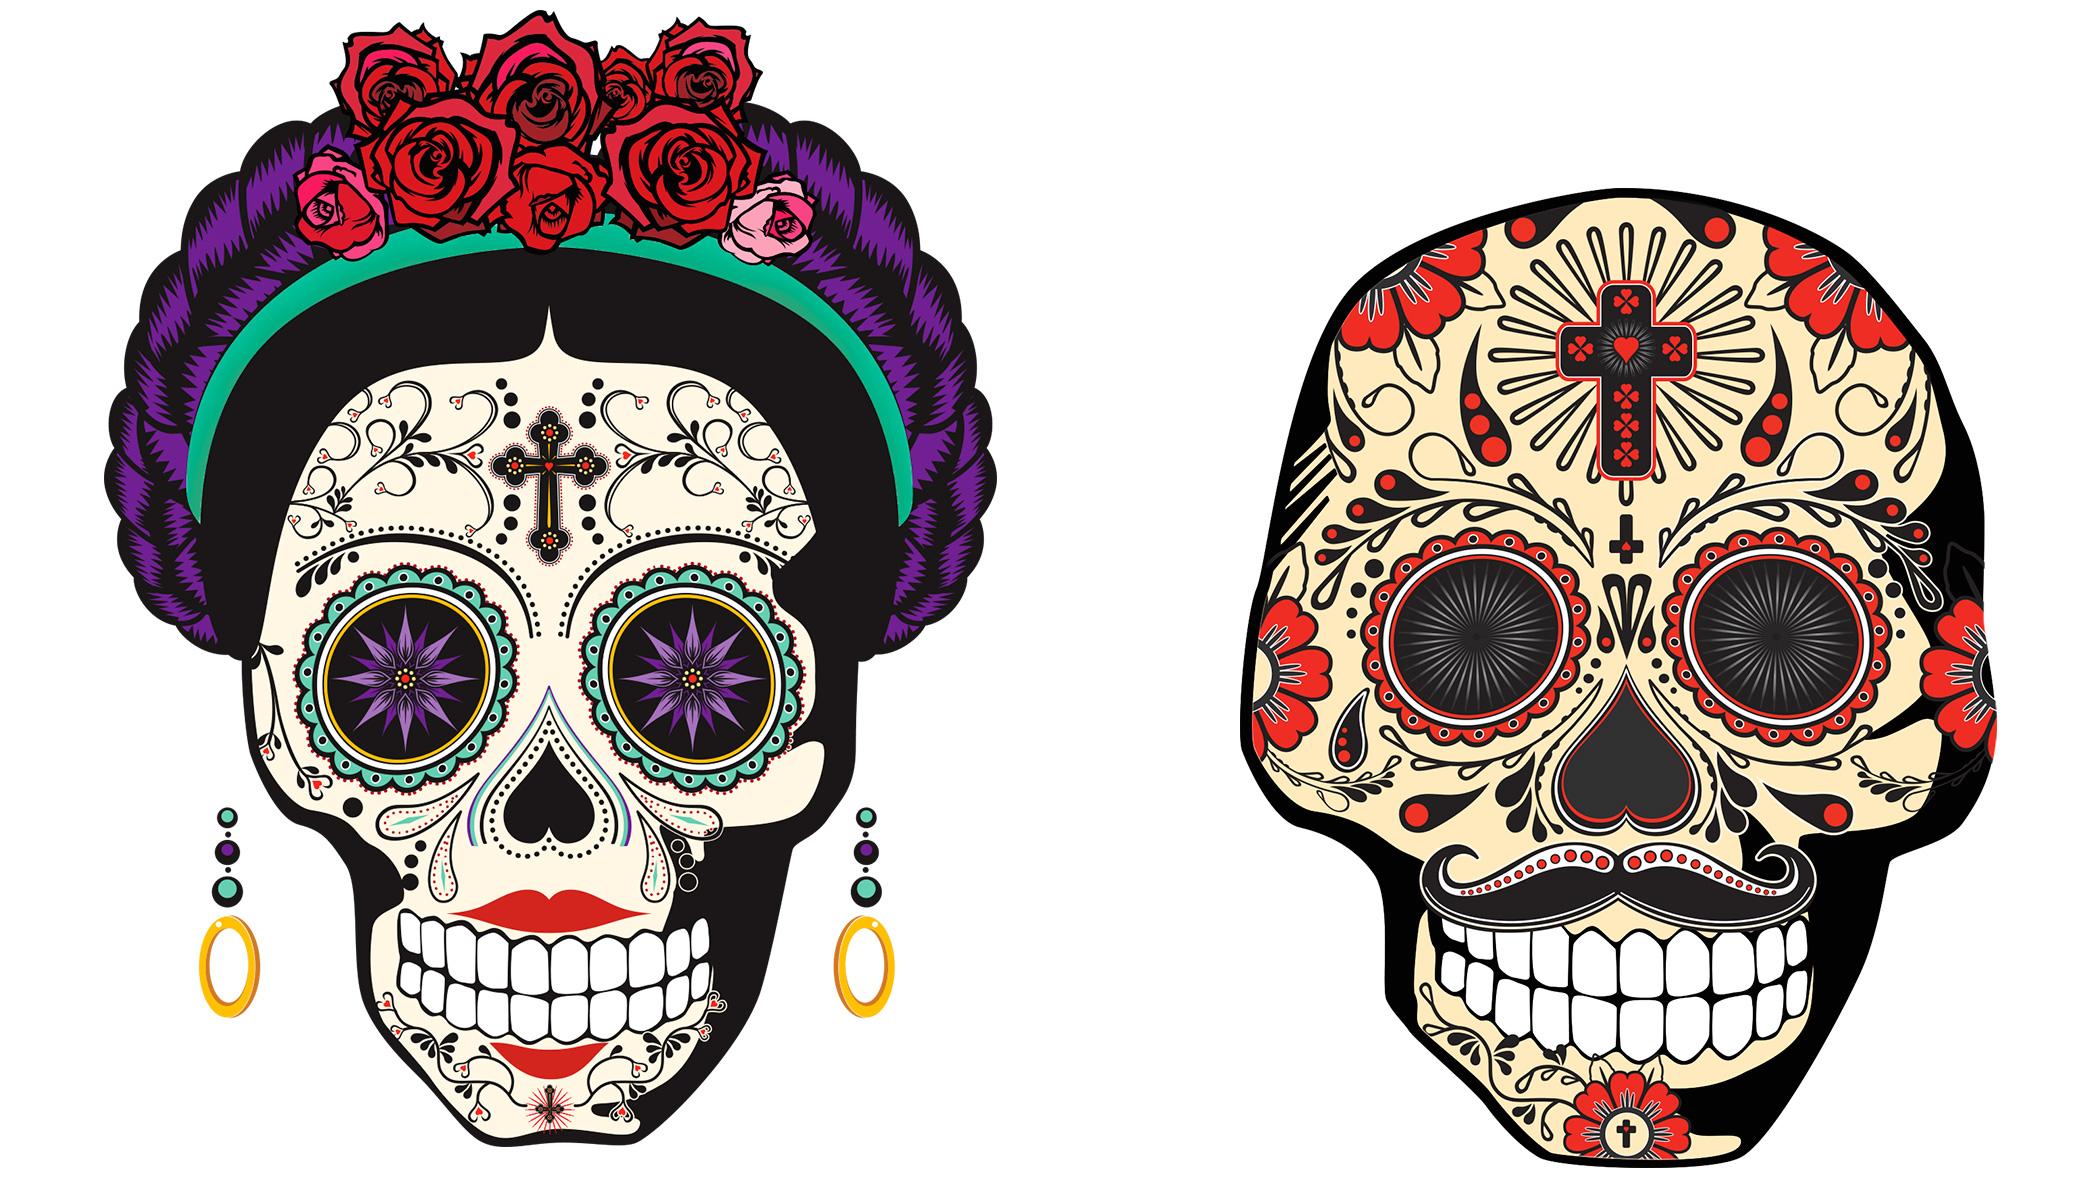 10 Steps To Make Your Facebook Group Go Viral - Ian David Chapman Dia de los muertos sugar skull pictures